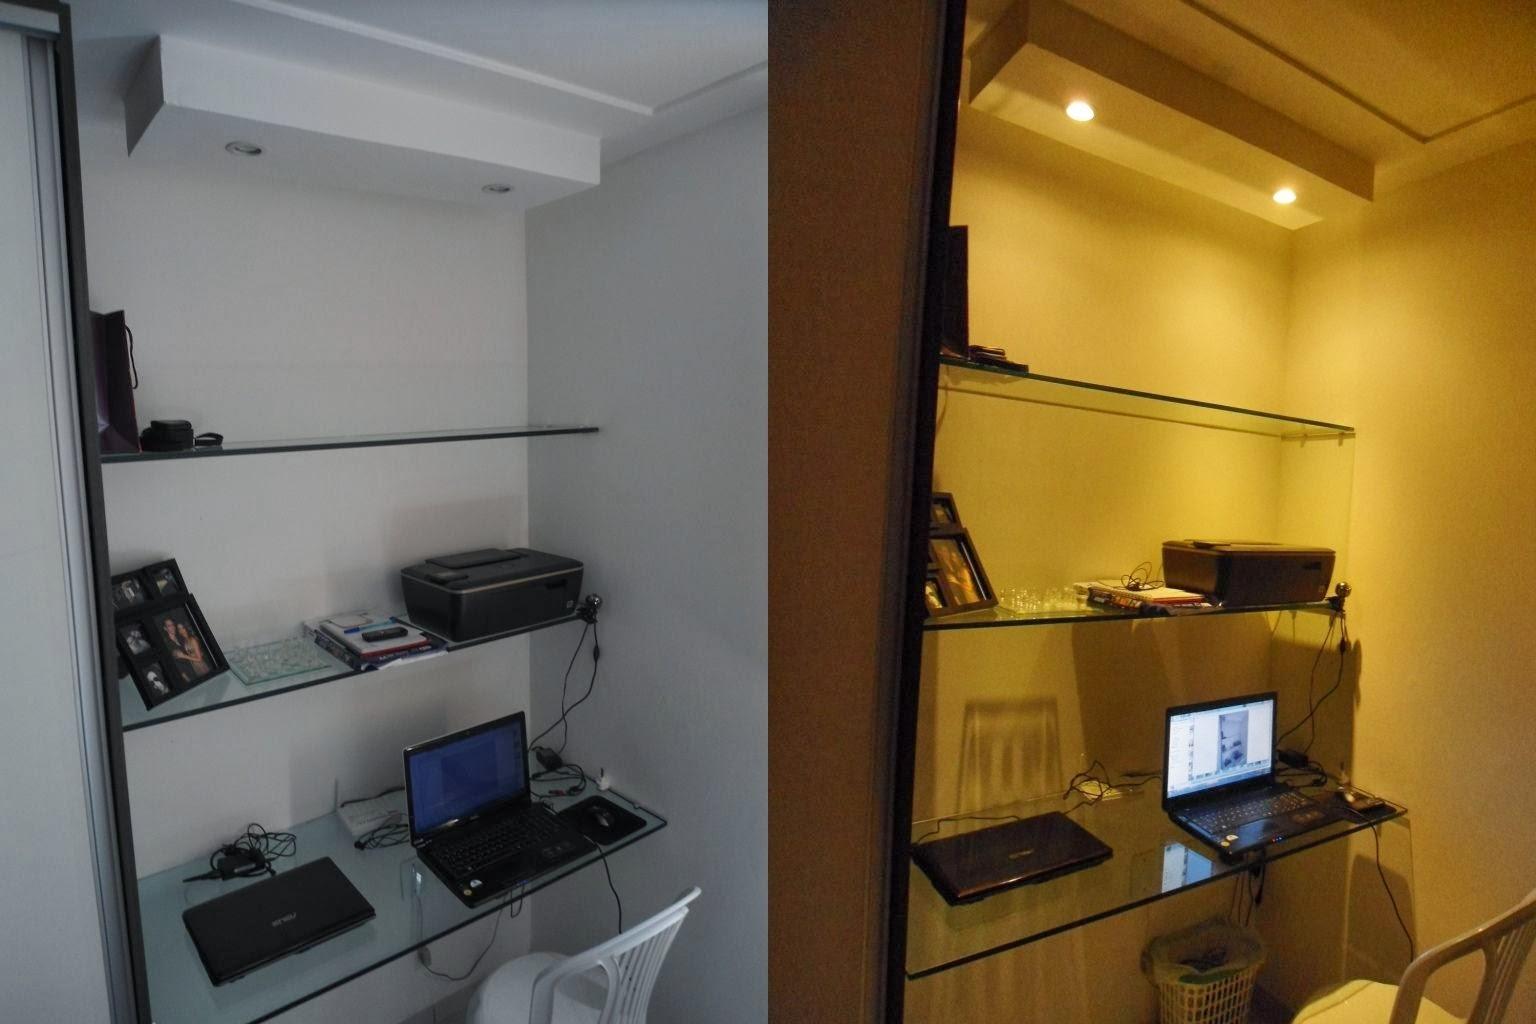 Escrivaninha de vidro ao lado do guarda roupas #B58A16 1536x1024